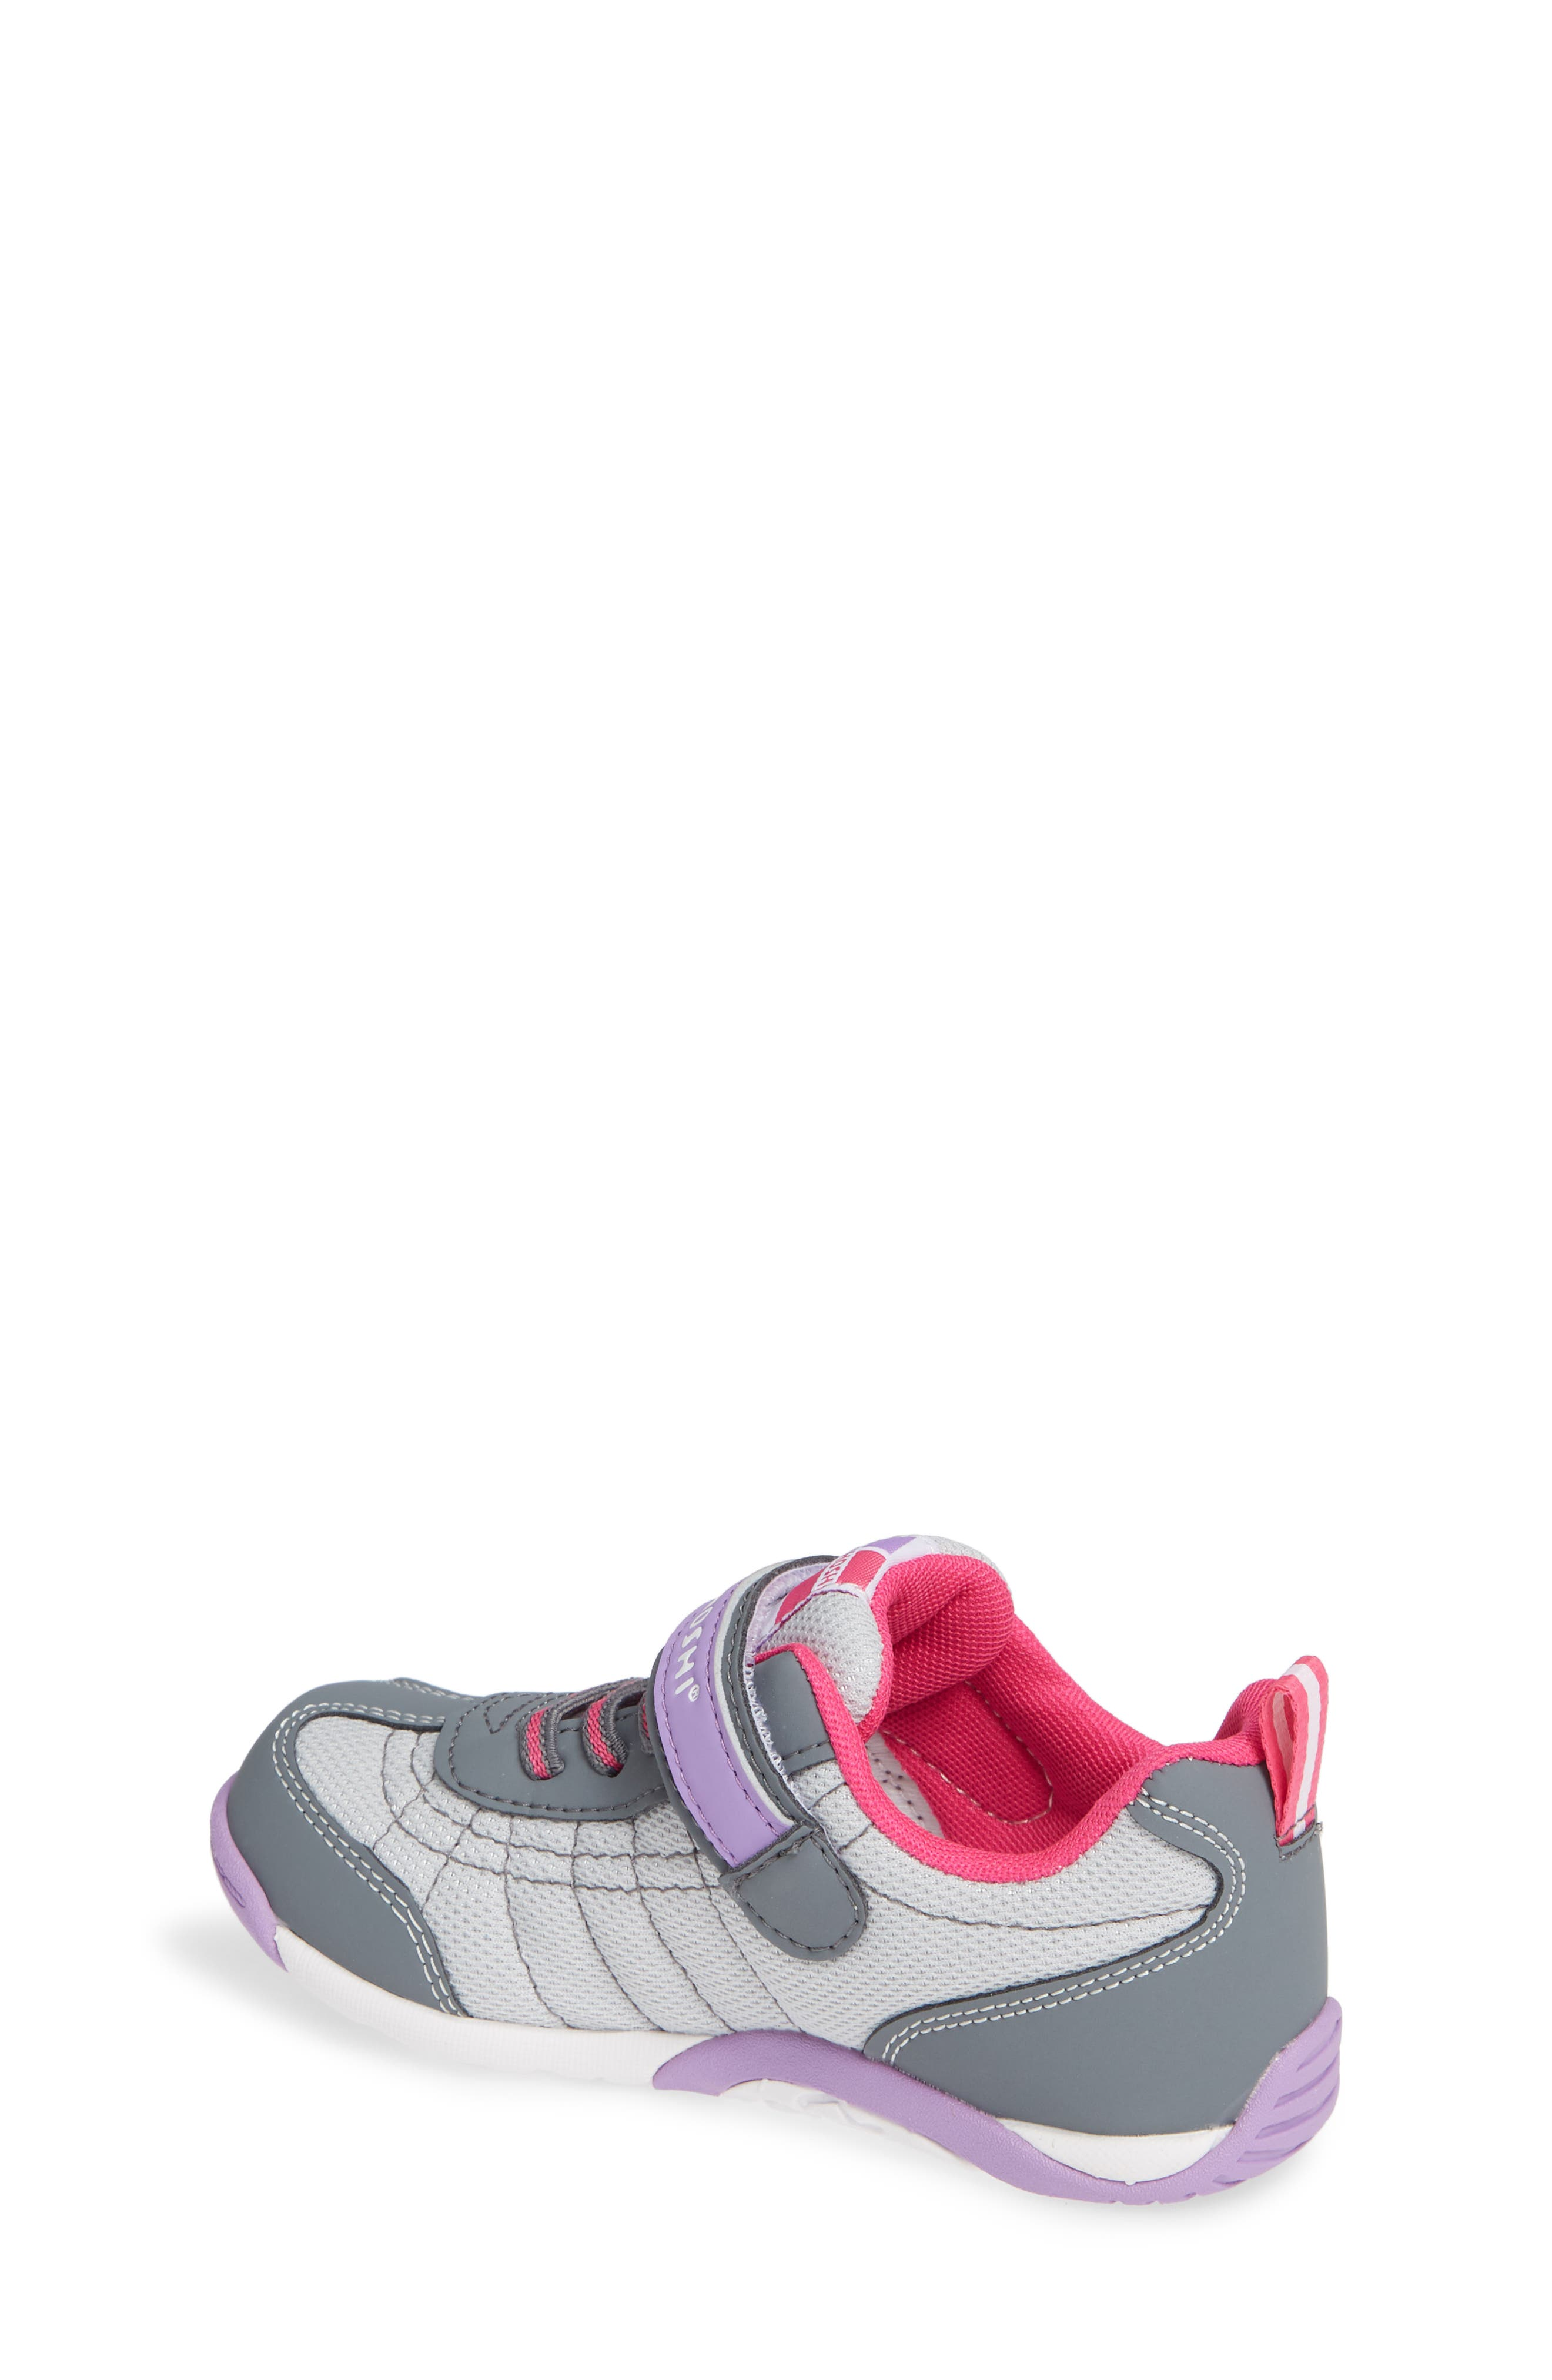 Kaz Washable Sneaker,                             Alternate thumbnail 2, color,                             Gray/ Purple